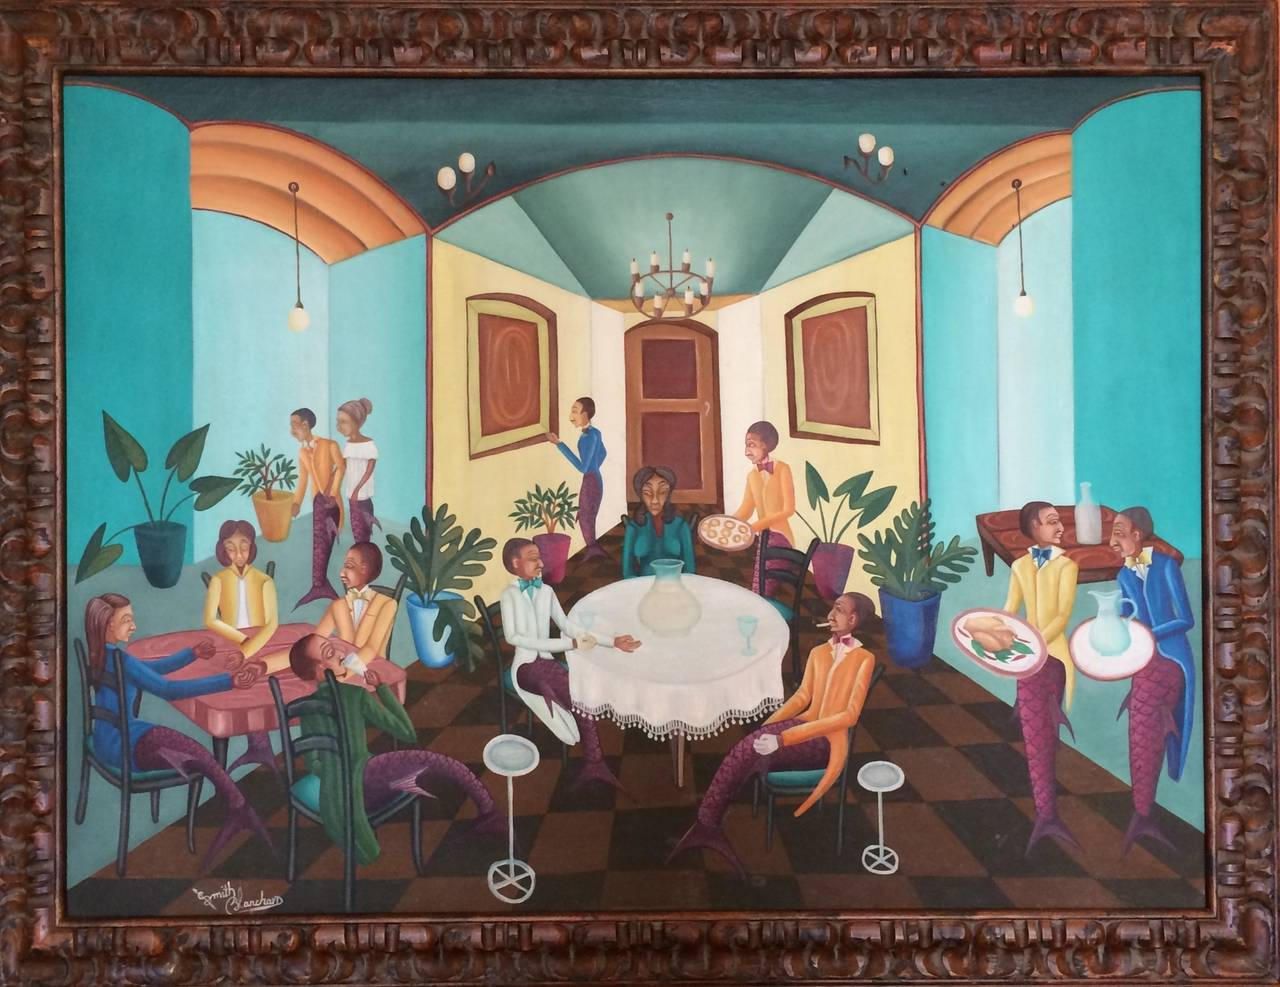 Surrealist Restaurant Scene with Mermades and Mermen 2